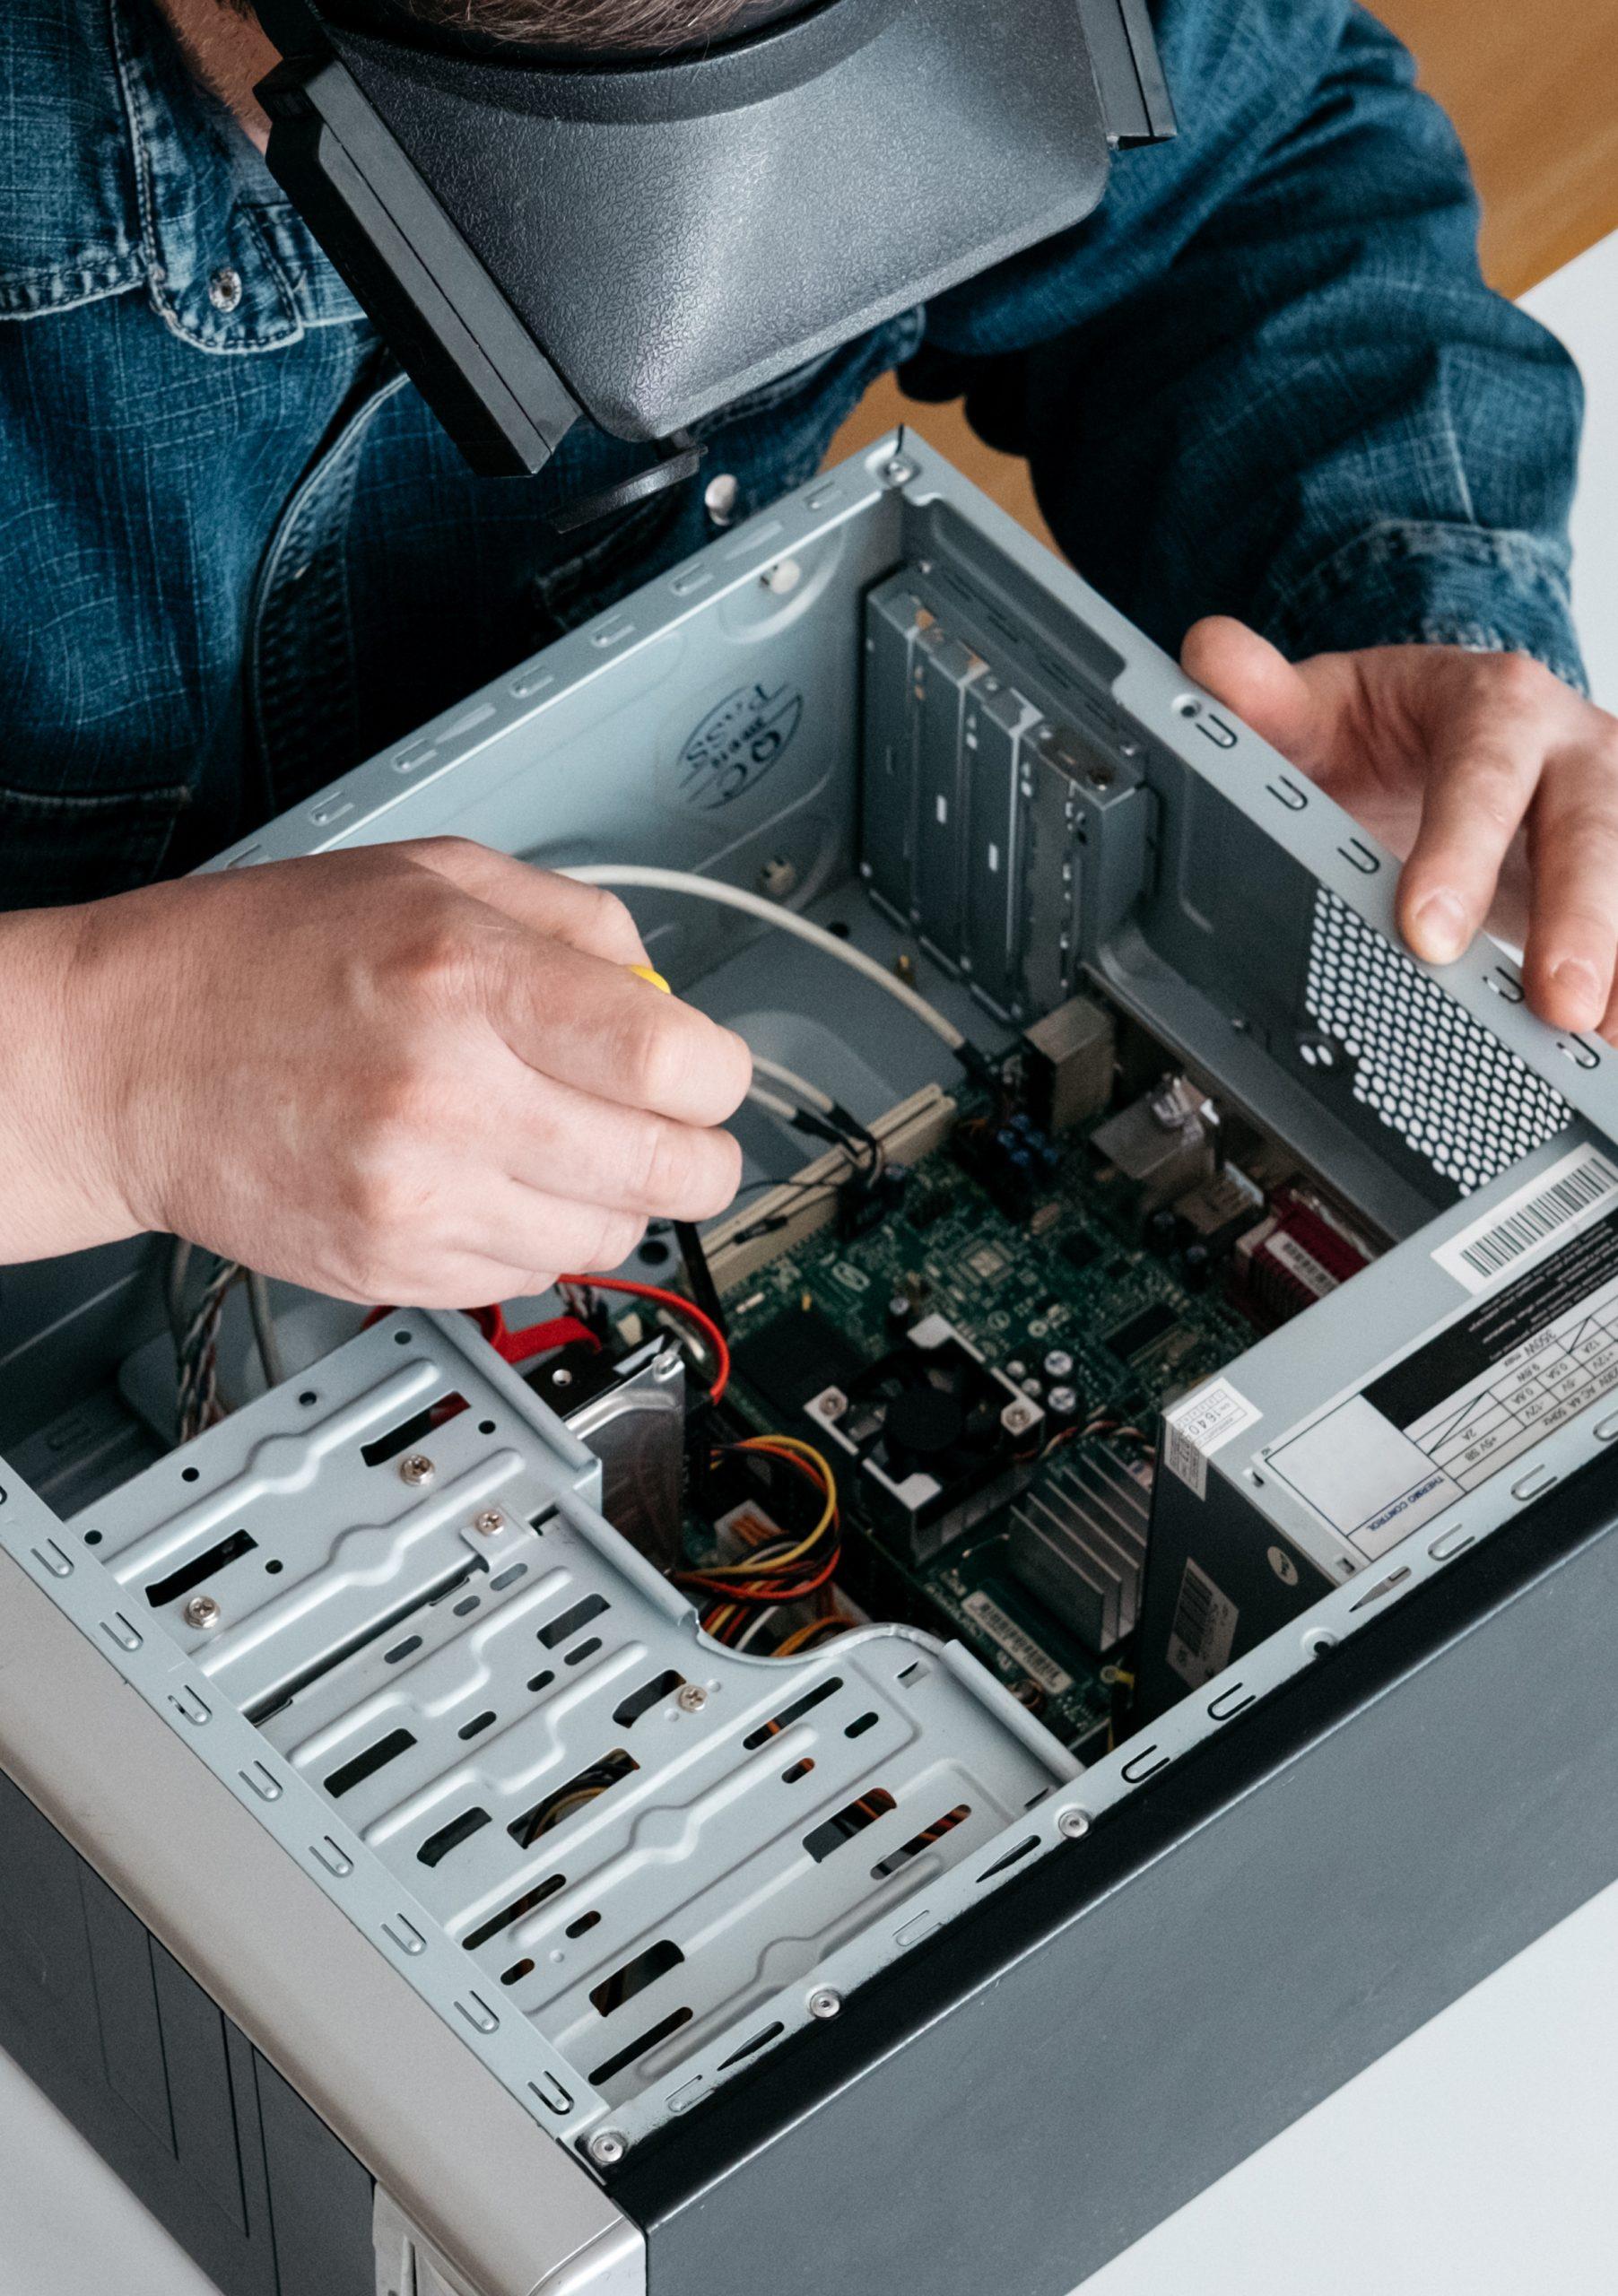 Personal computer repairing service, professional technician with magnifying glasses and screwdriver repairing broken pc desktop computer in workshop.